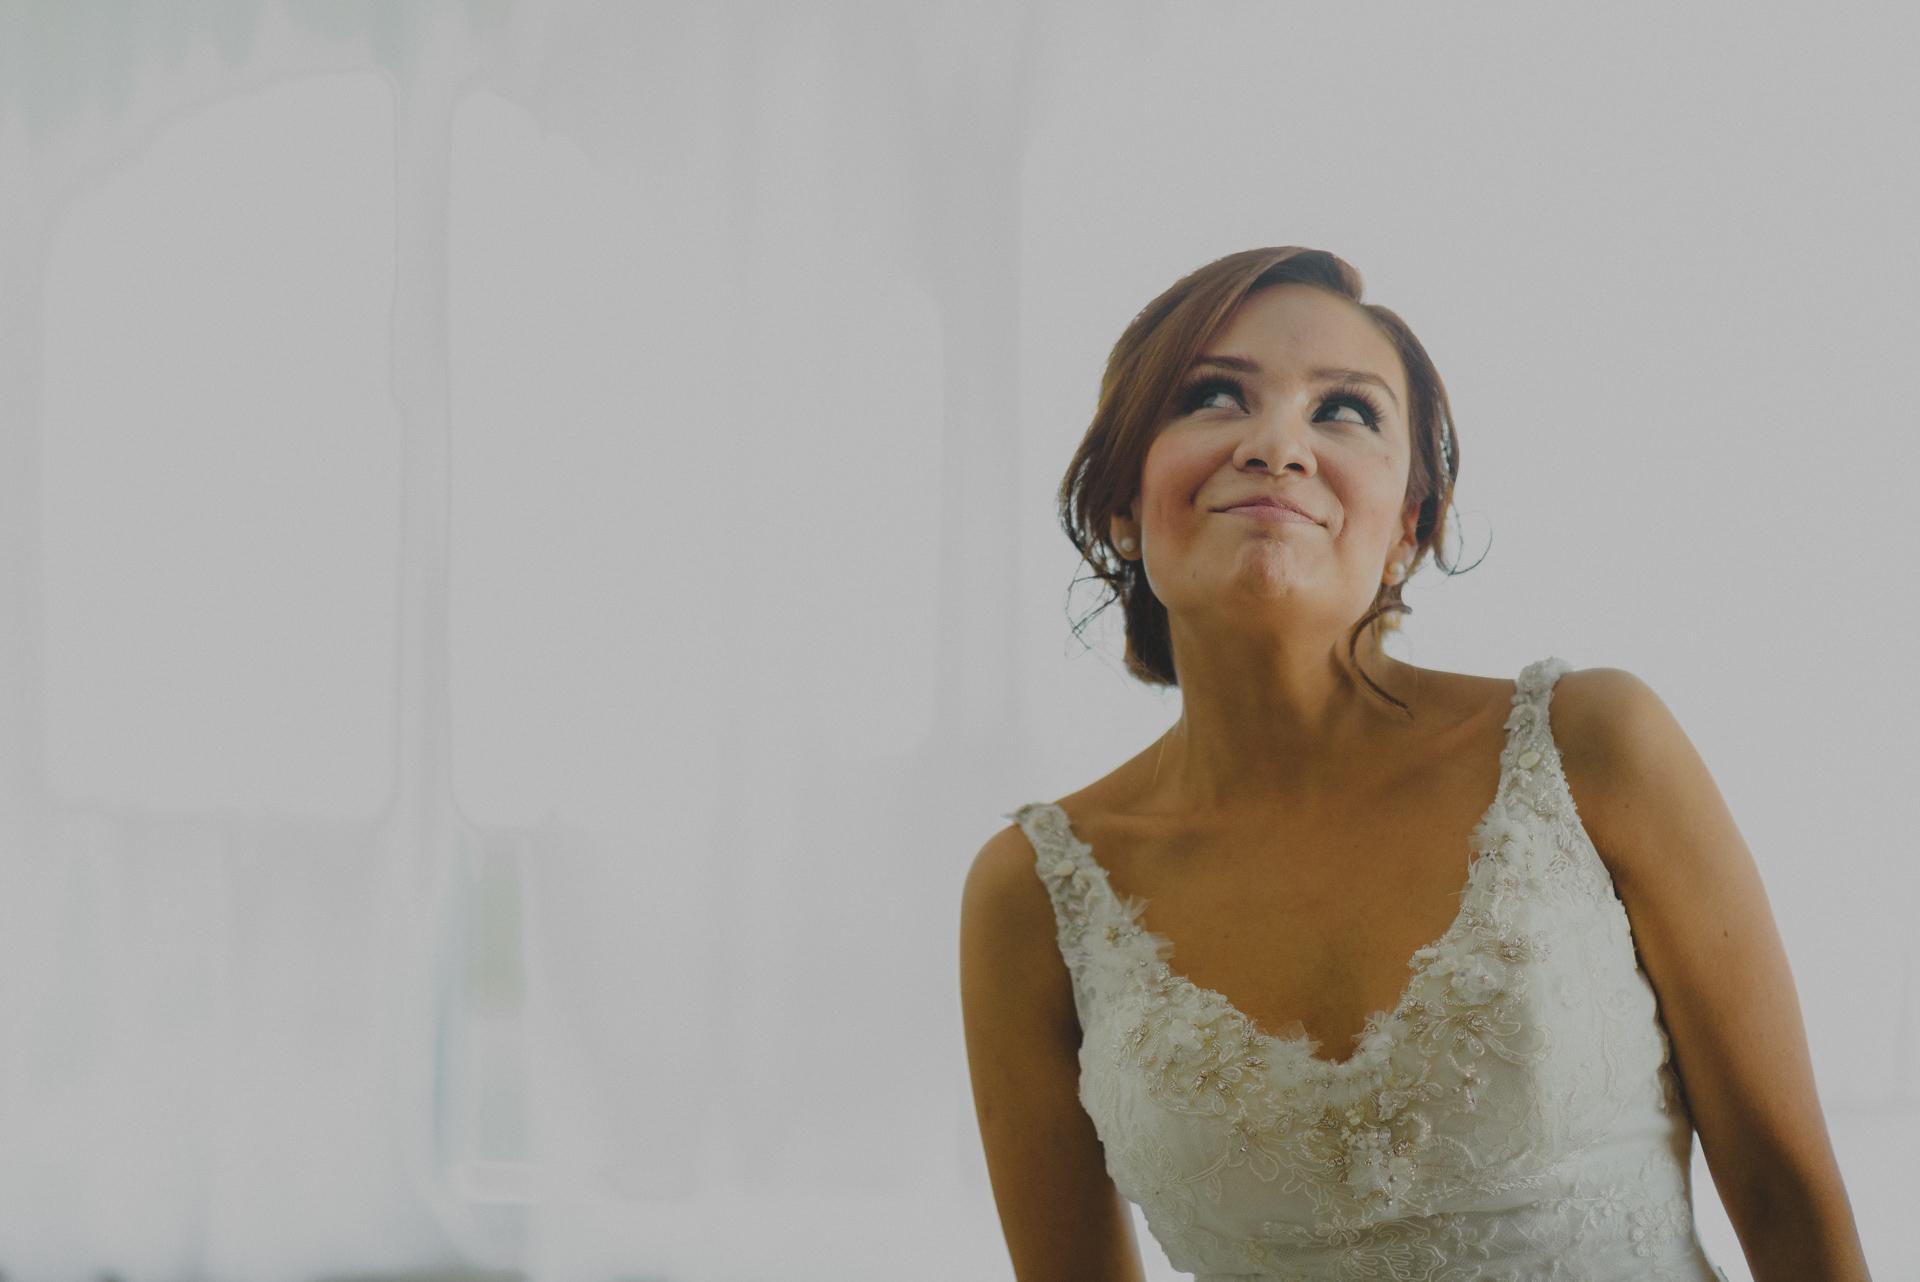 Wedding N&M BLOG luishoudin.com (23 de 174)